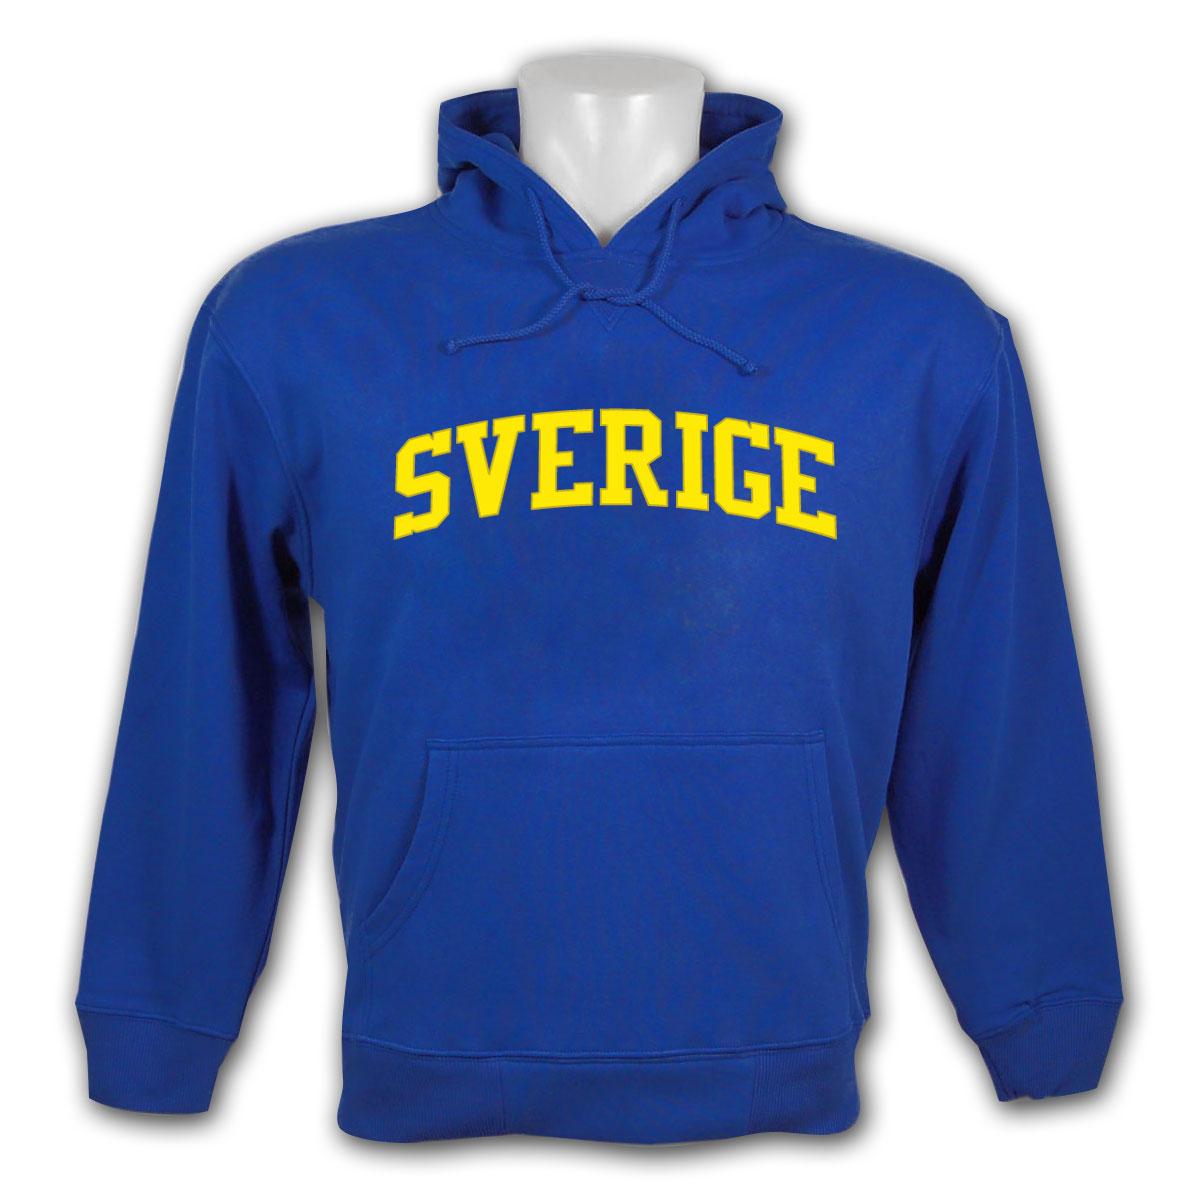 Sweden Patriotic Pullover Hoody (Royal) - IceJerseys - image 1 of 1